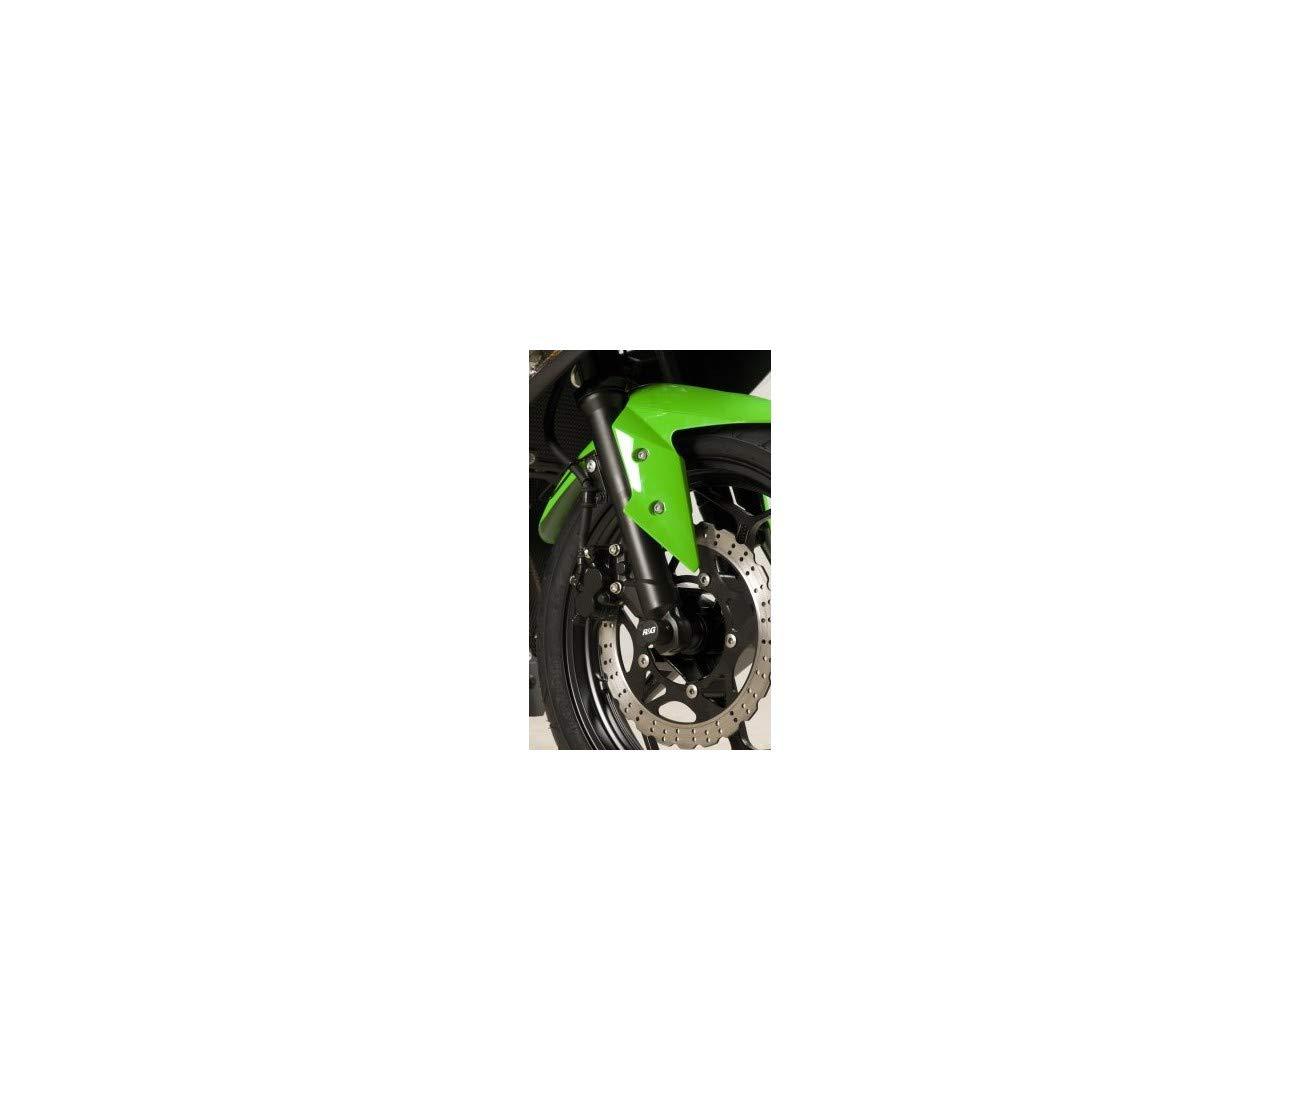 Kawasaki 300 Ninja/Z300 - 13/17-protections de horquilla R ...